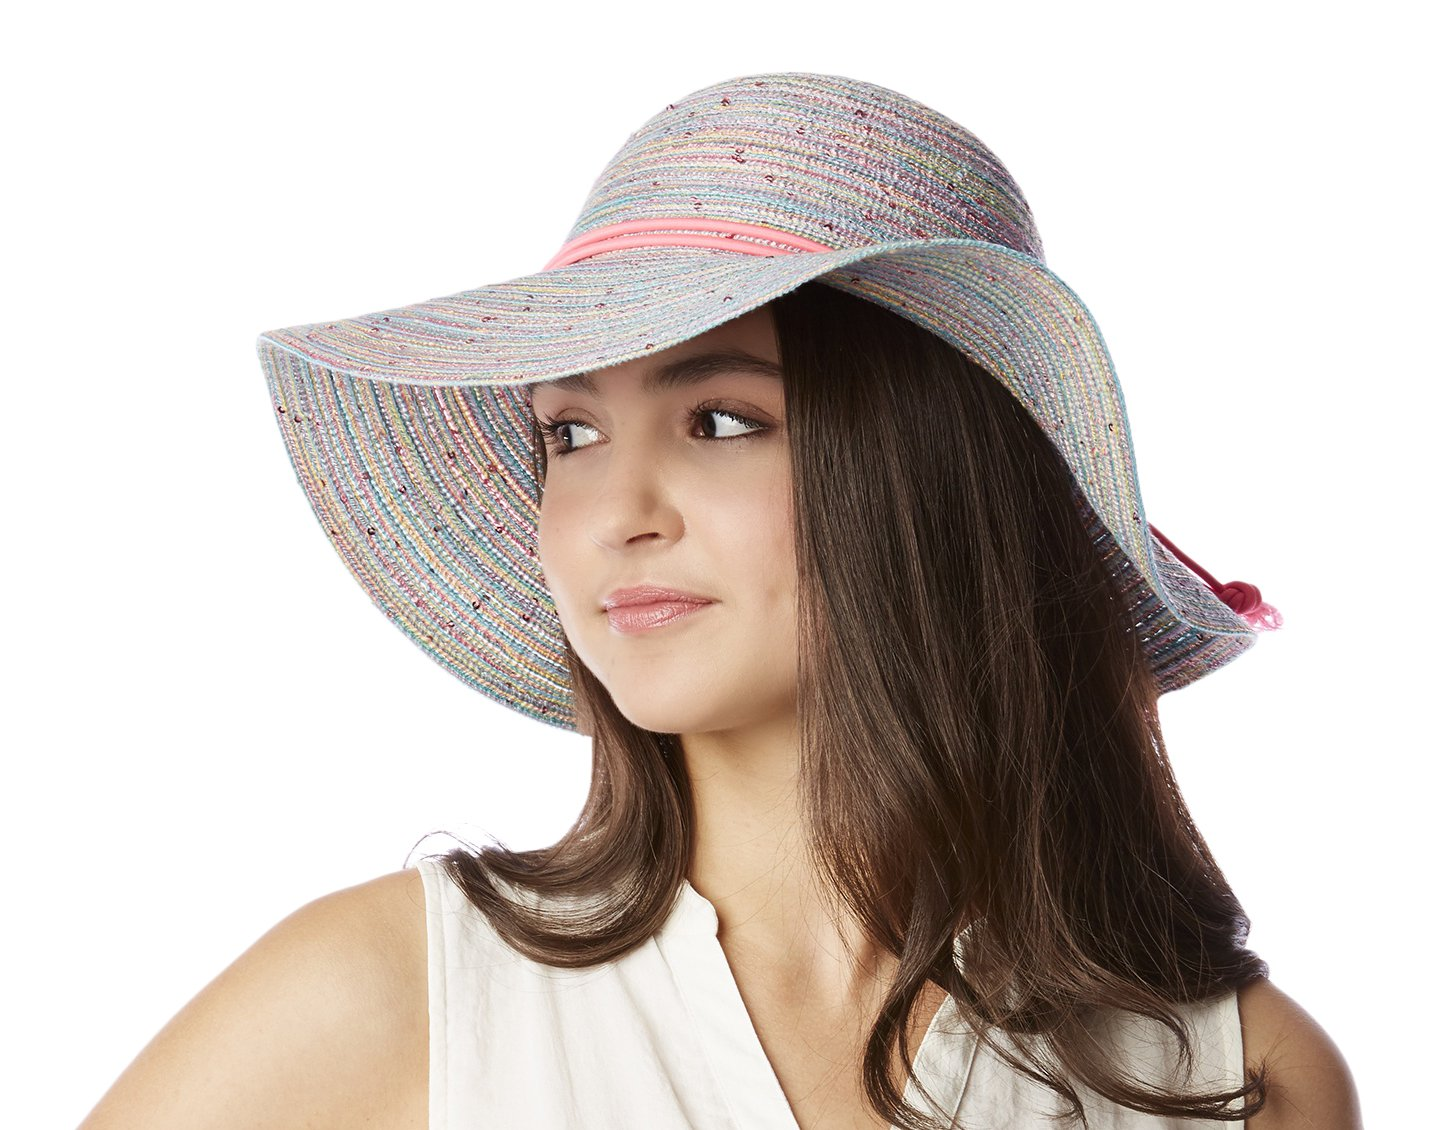 rainiersun Mujer clásico sombrero Screamer 1350 1de77cb1912